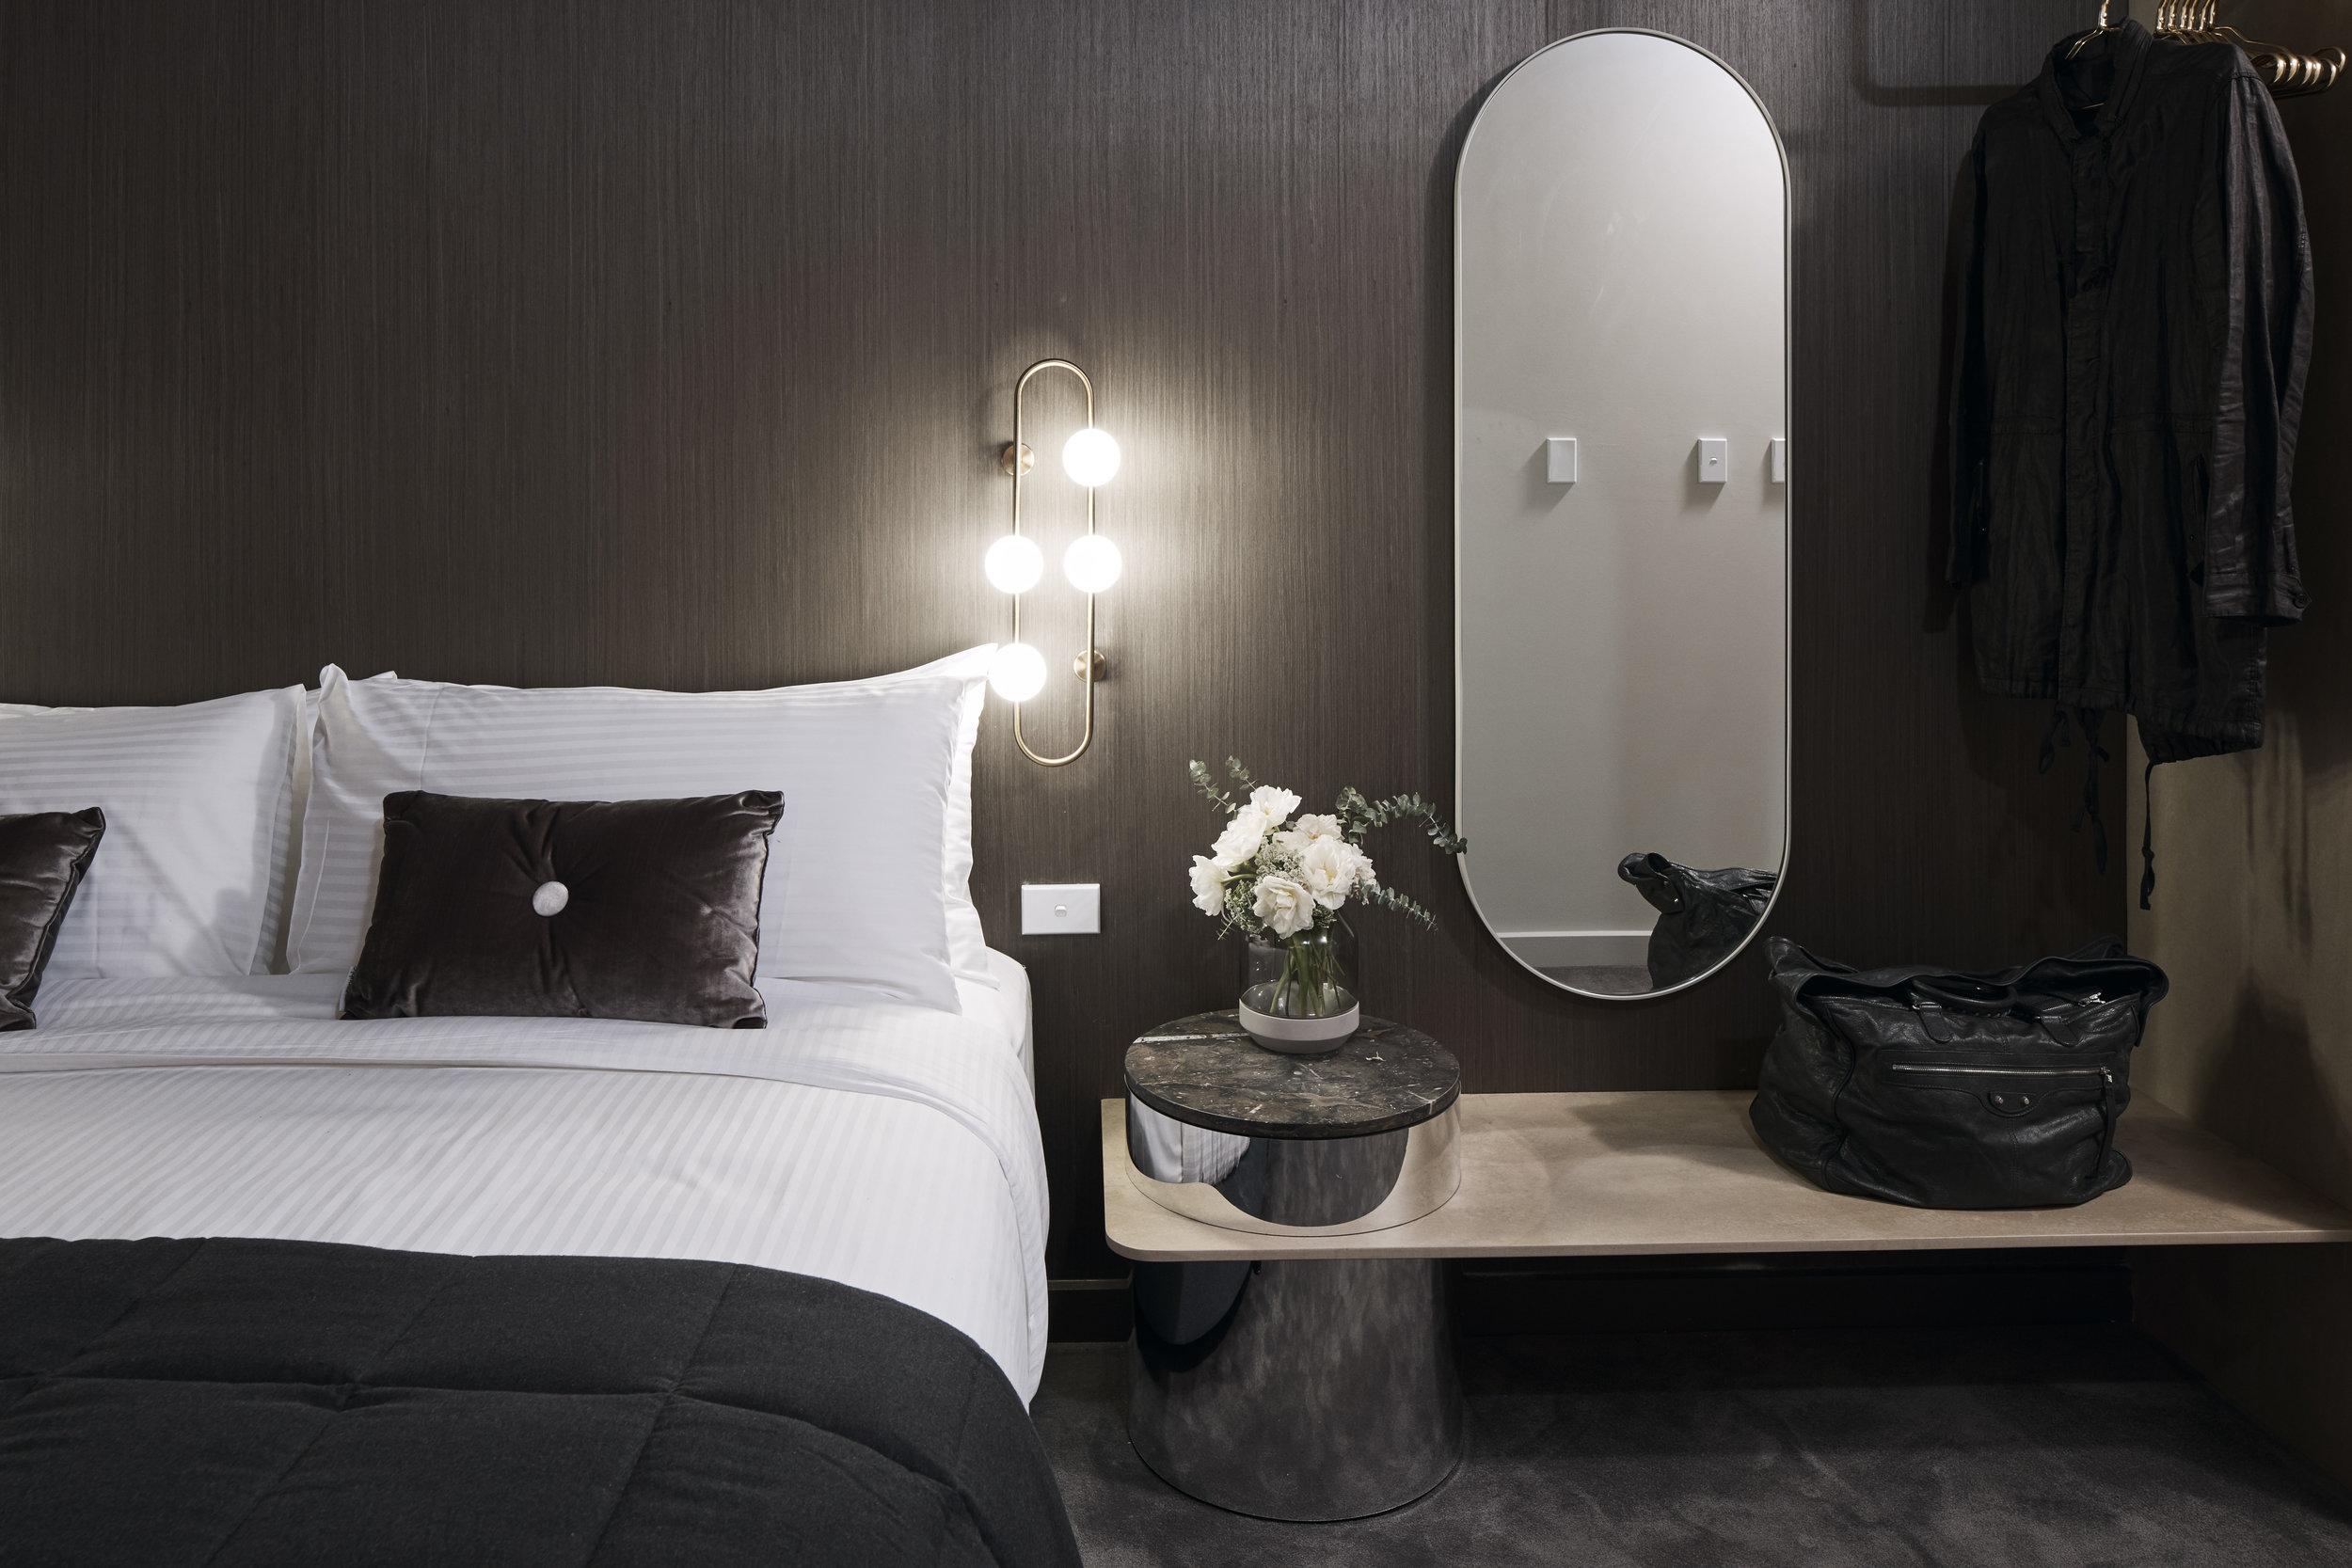 Grigio room by Willis Sheargold